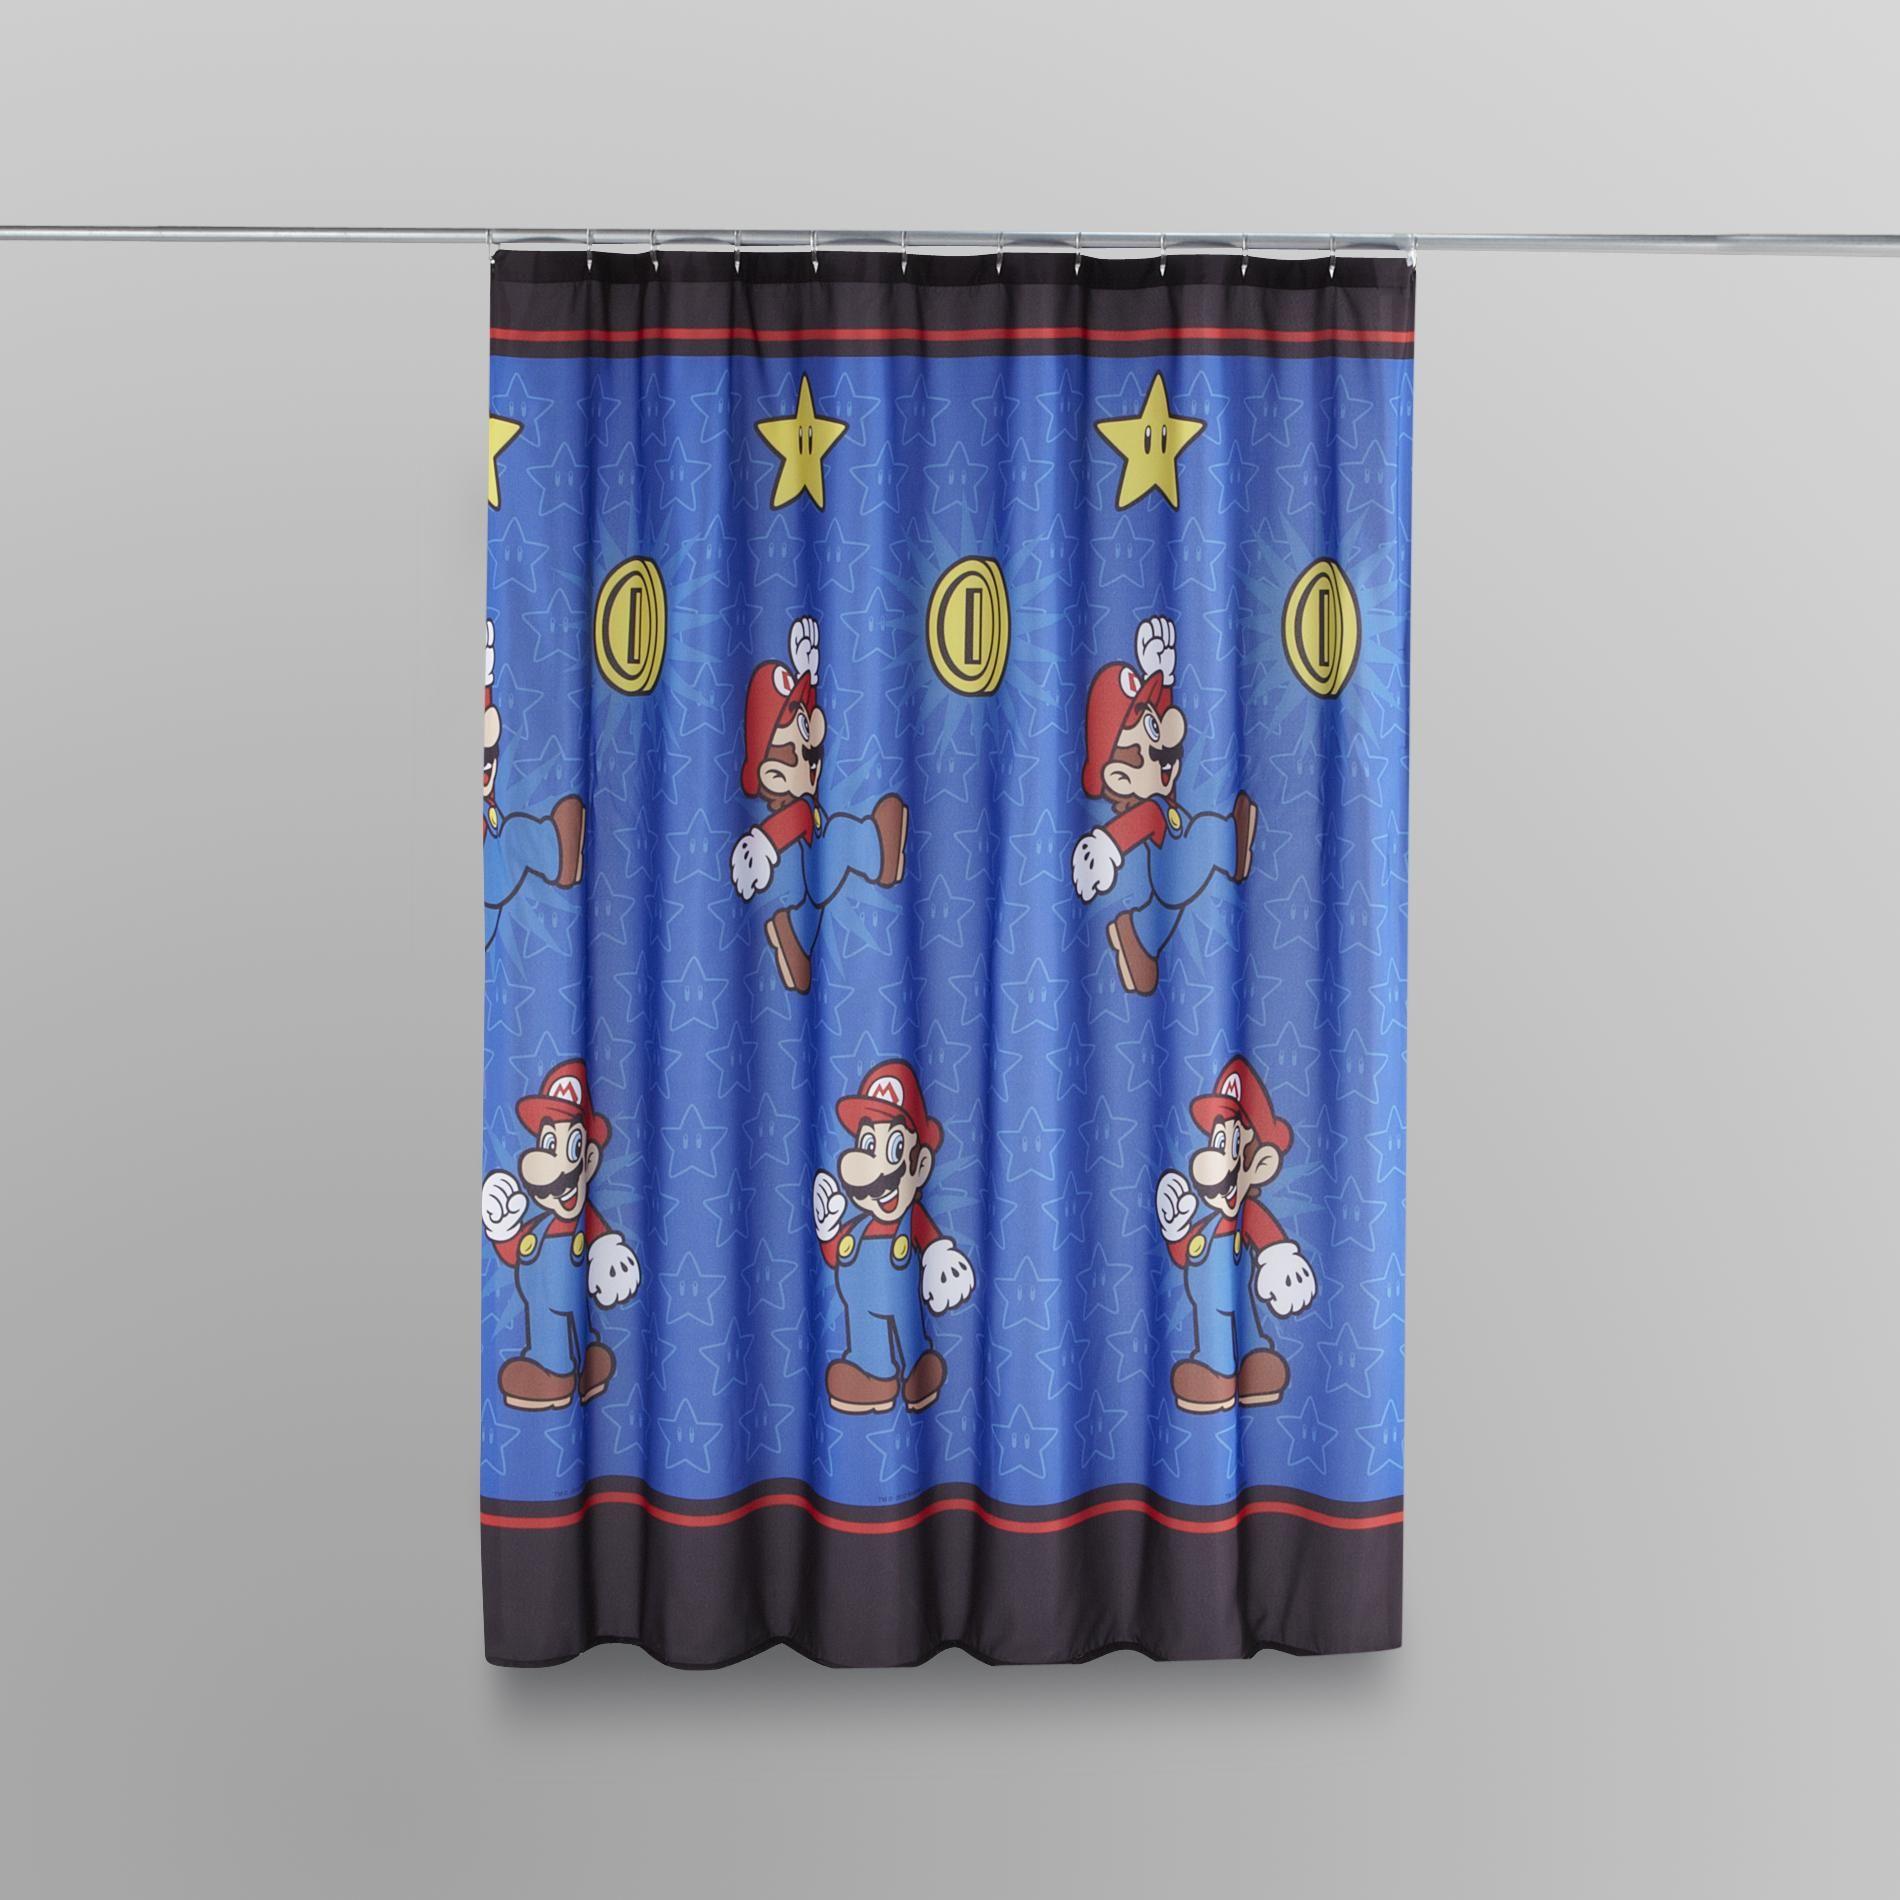 Nintendo Super Mario Shower Curtain   Bed Bath   Shower Curtains Accessories    Shower Curtains Liners